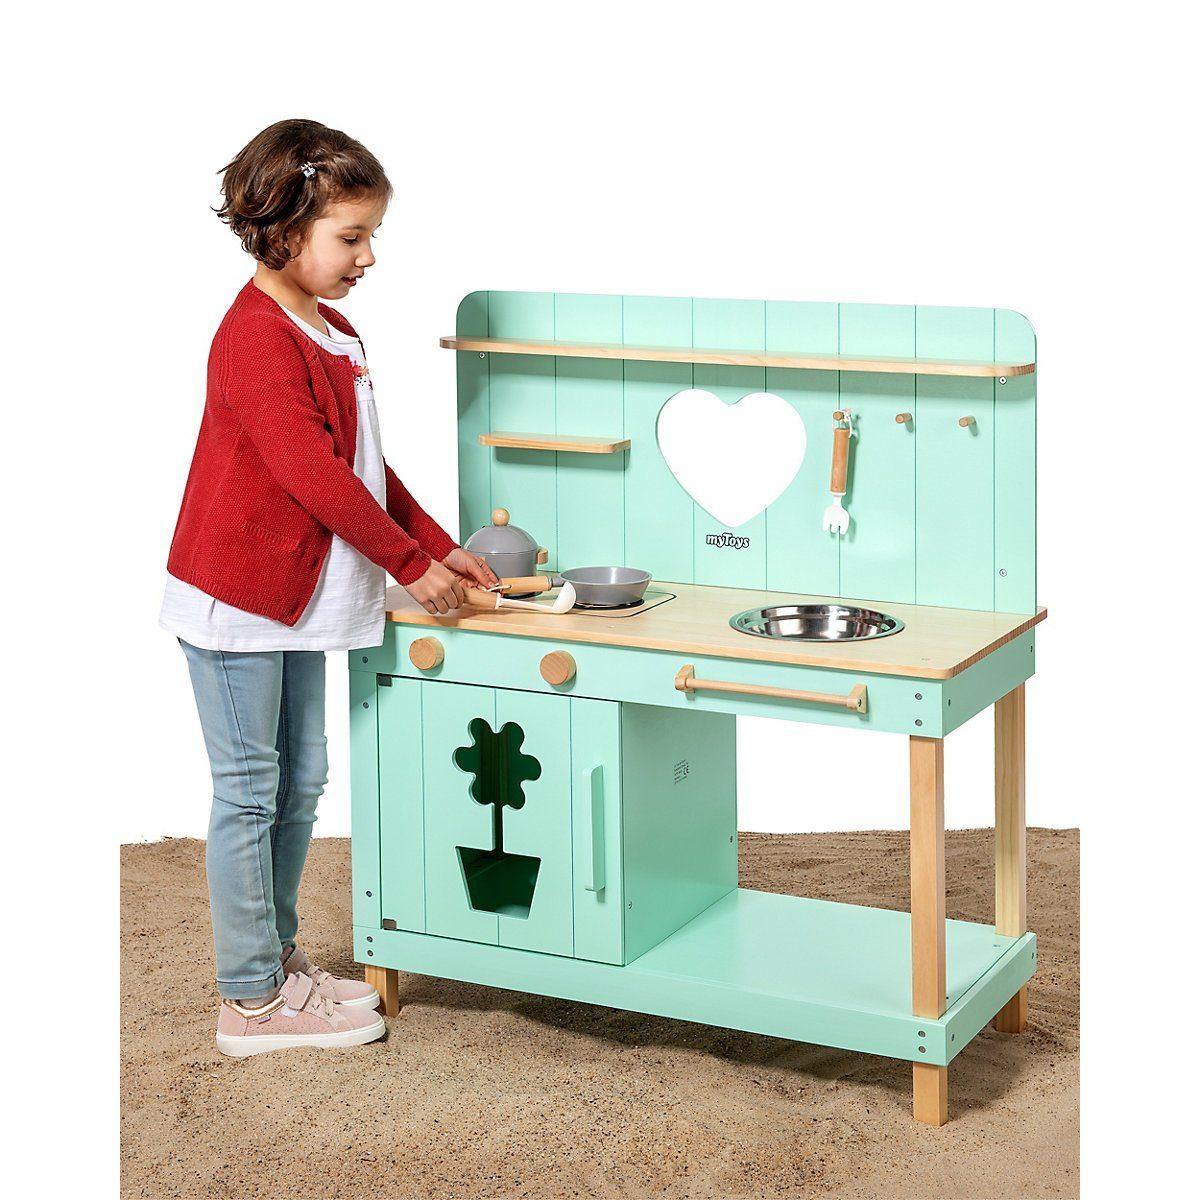 Spielküche MYTOYS MATSCHKÜCHE, In- und Outdoor Holz von MYTOYS - MYTOYS